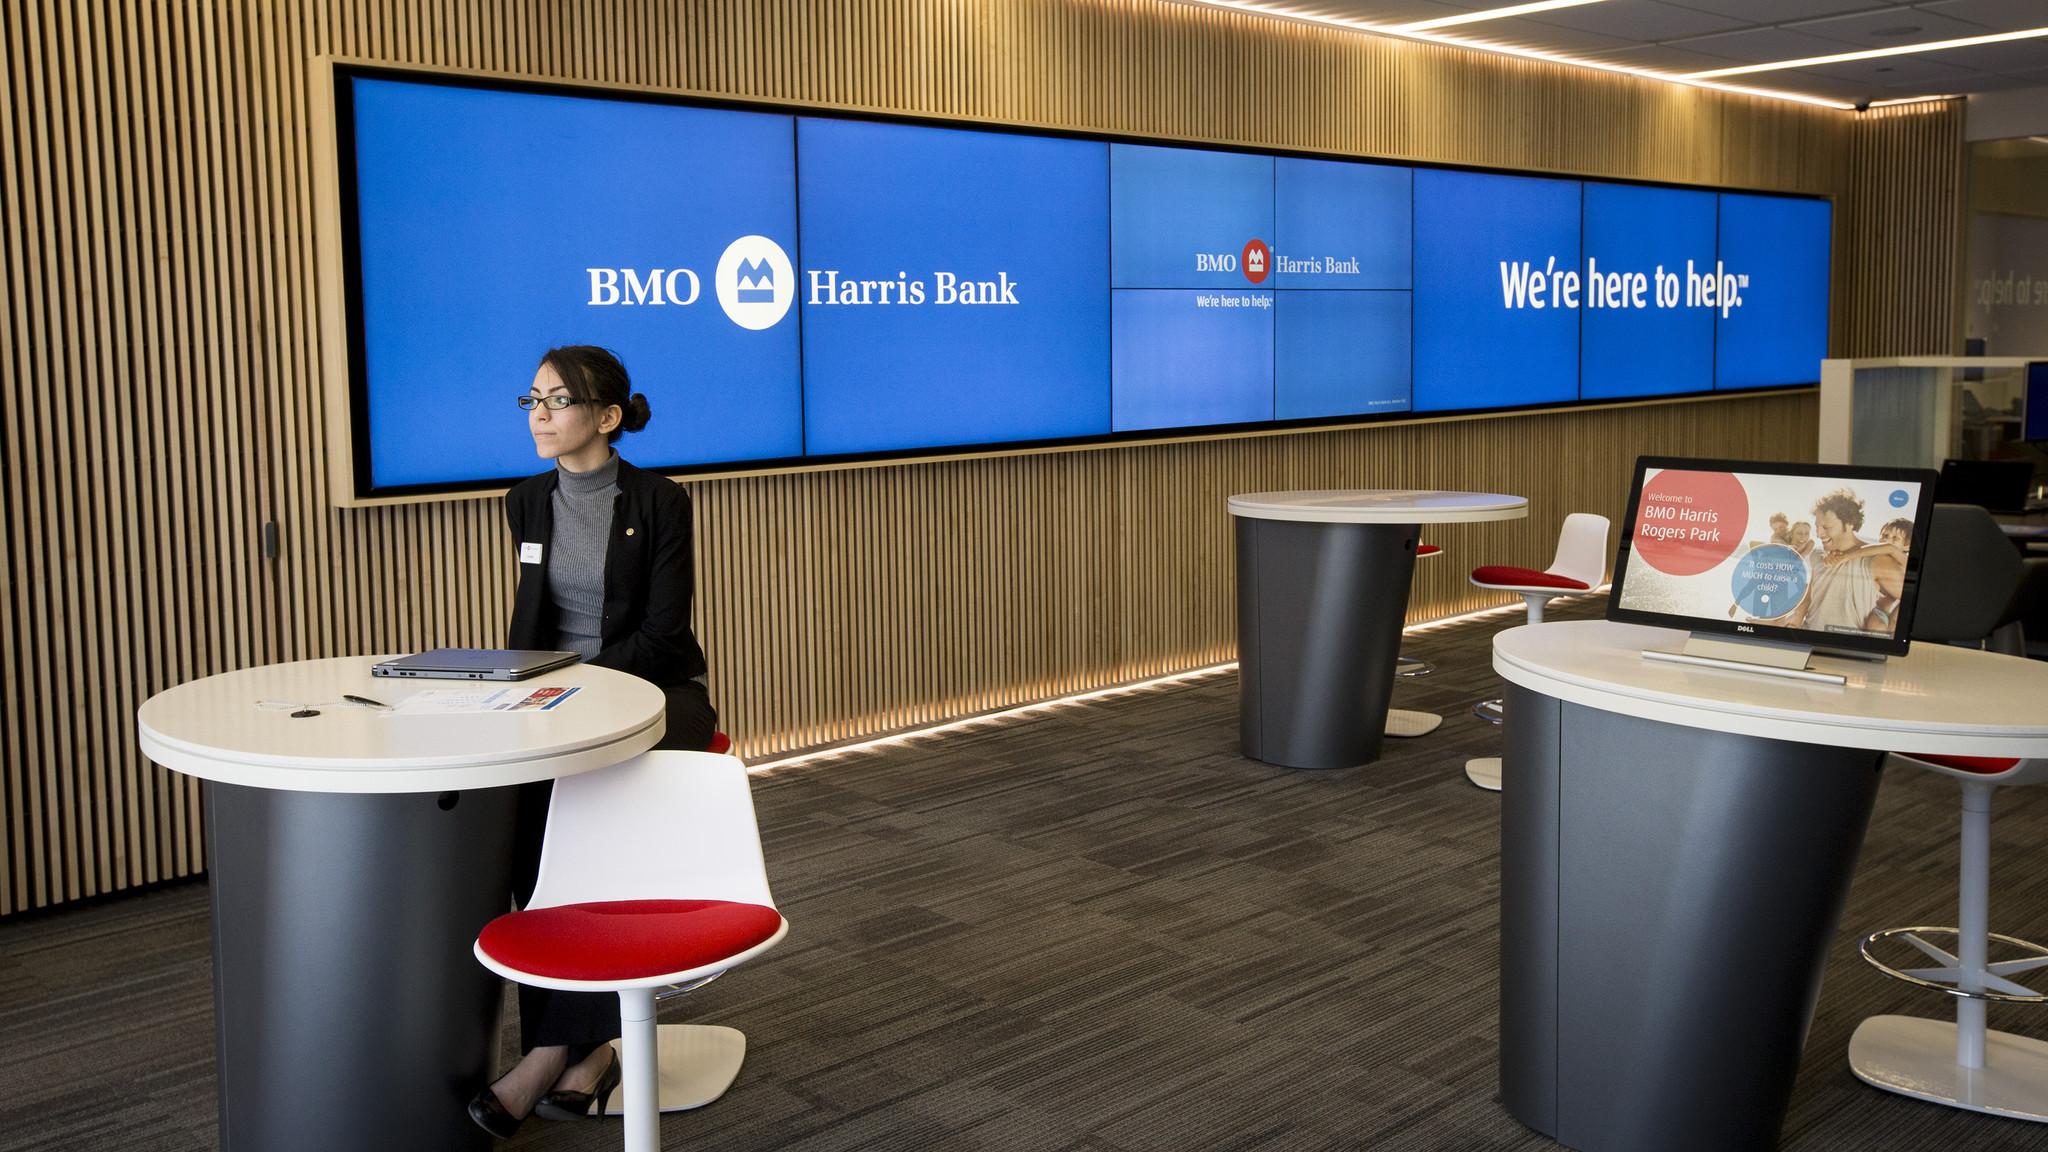 Owner Of Bmo Harris Bank Announces Job Cuts Chicago Tribune